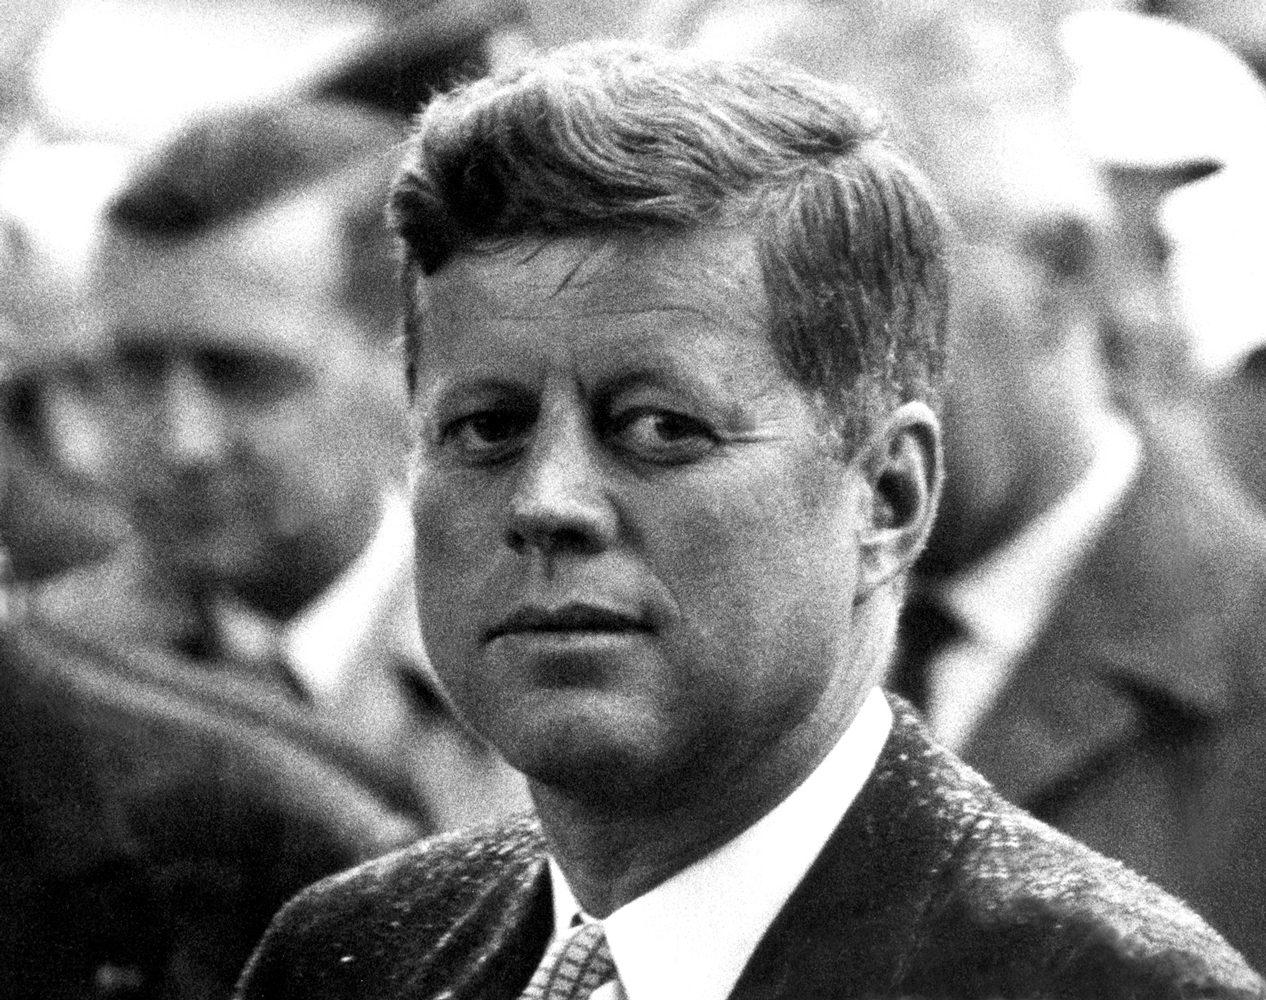 President John F. Kennedy Portrait, Paris